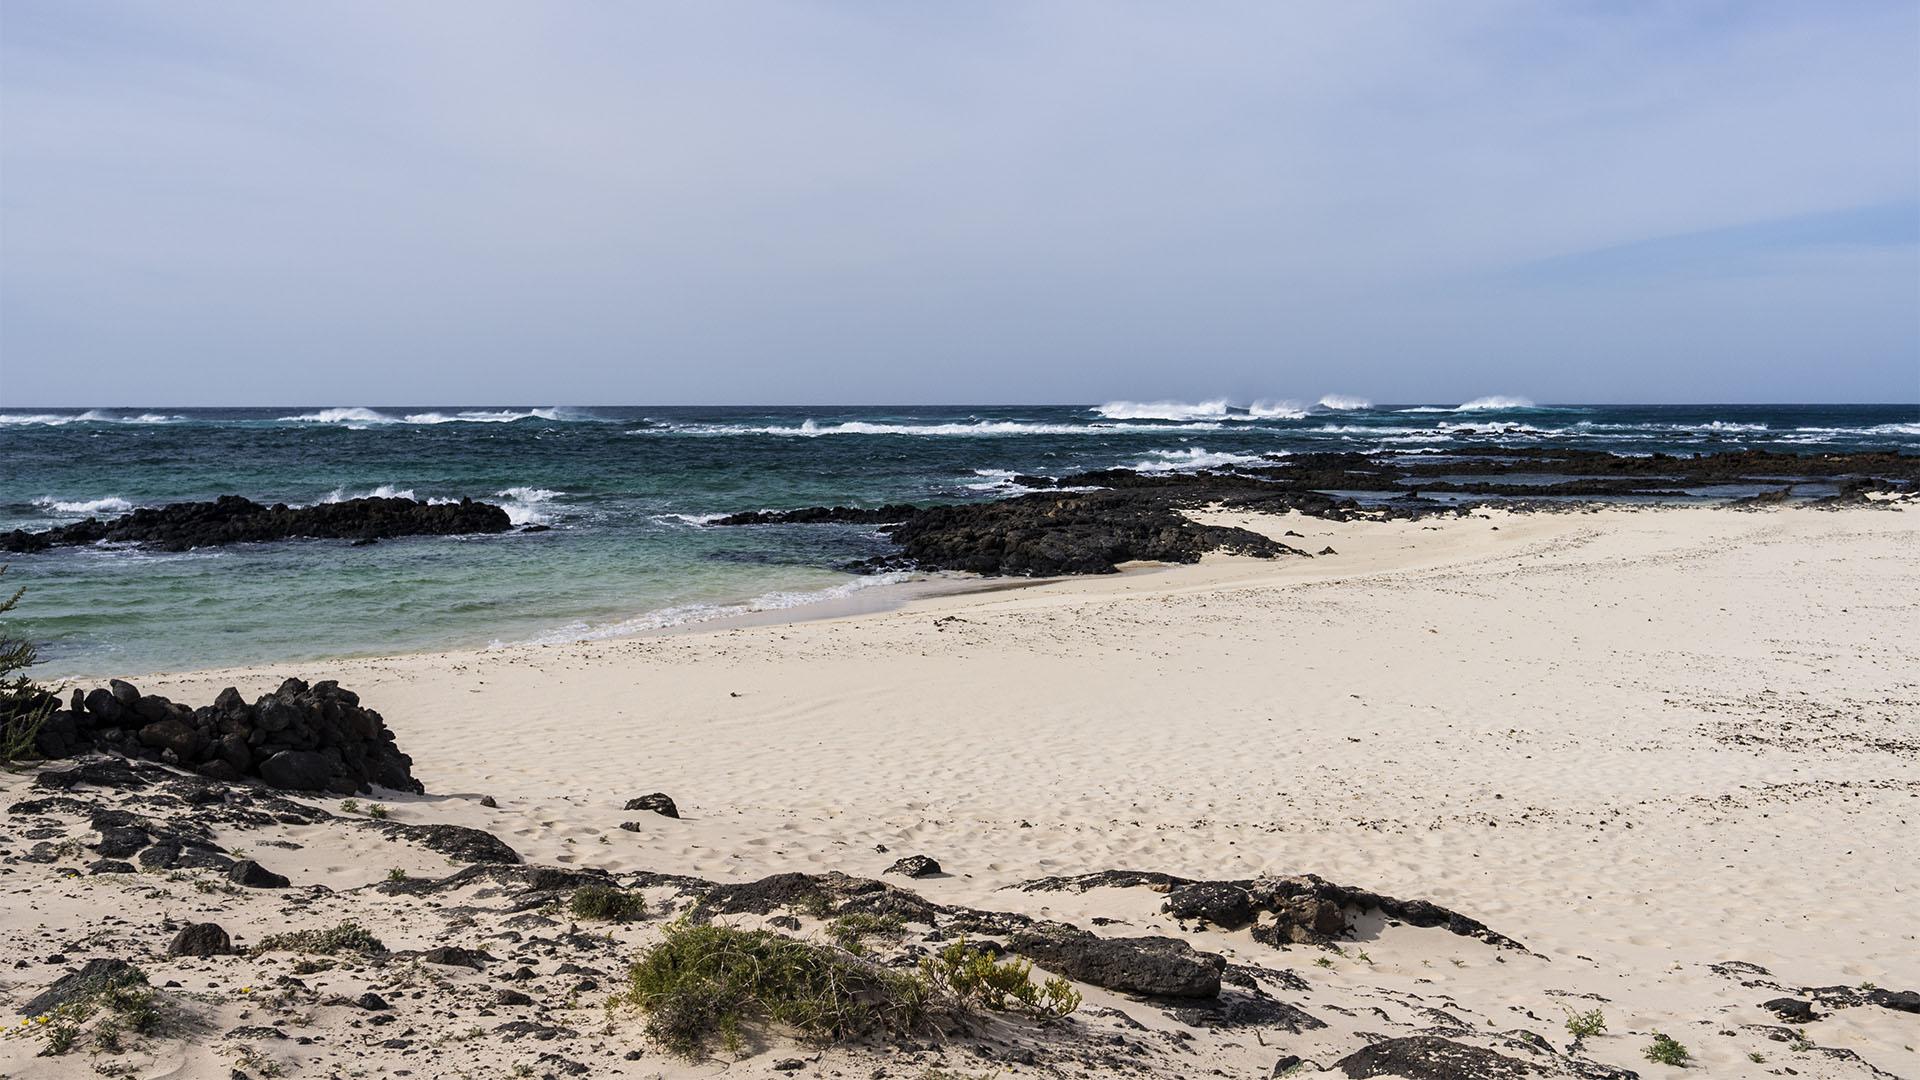 Die Strände Fuerteventuras: Paso pelado